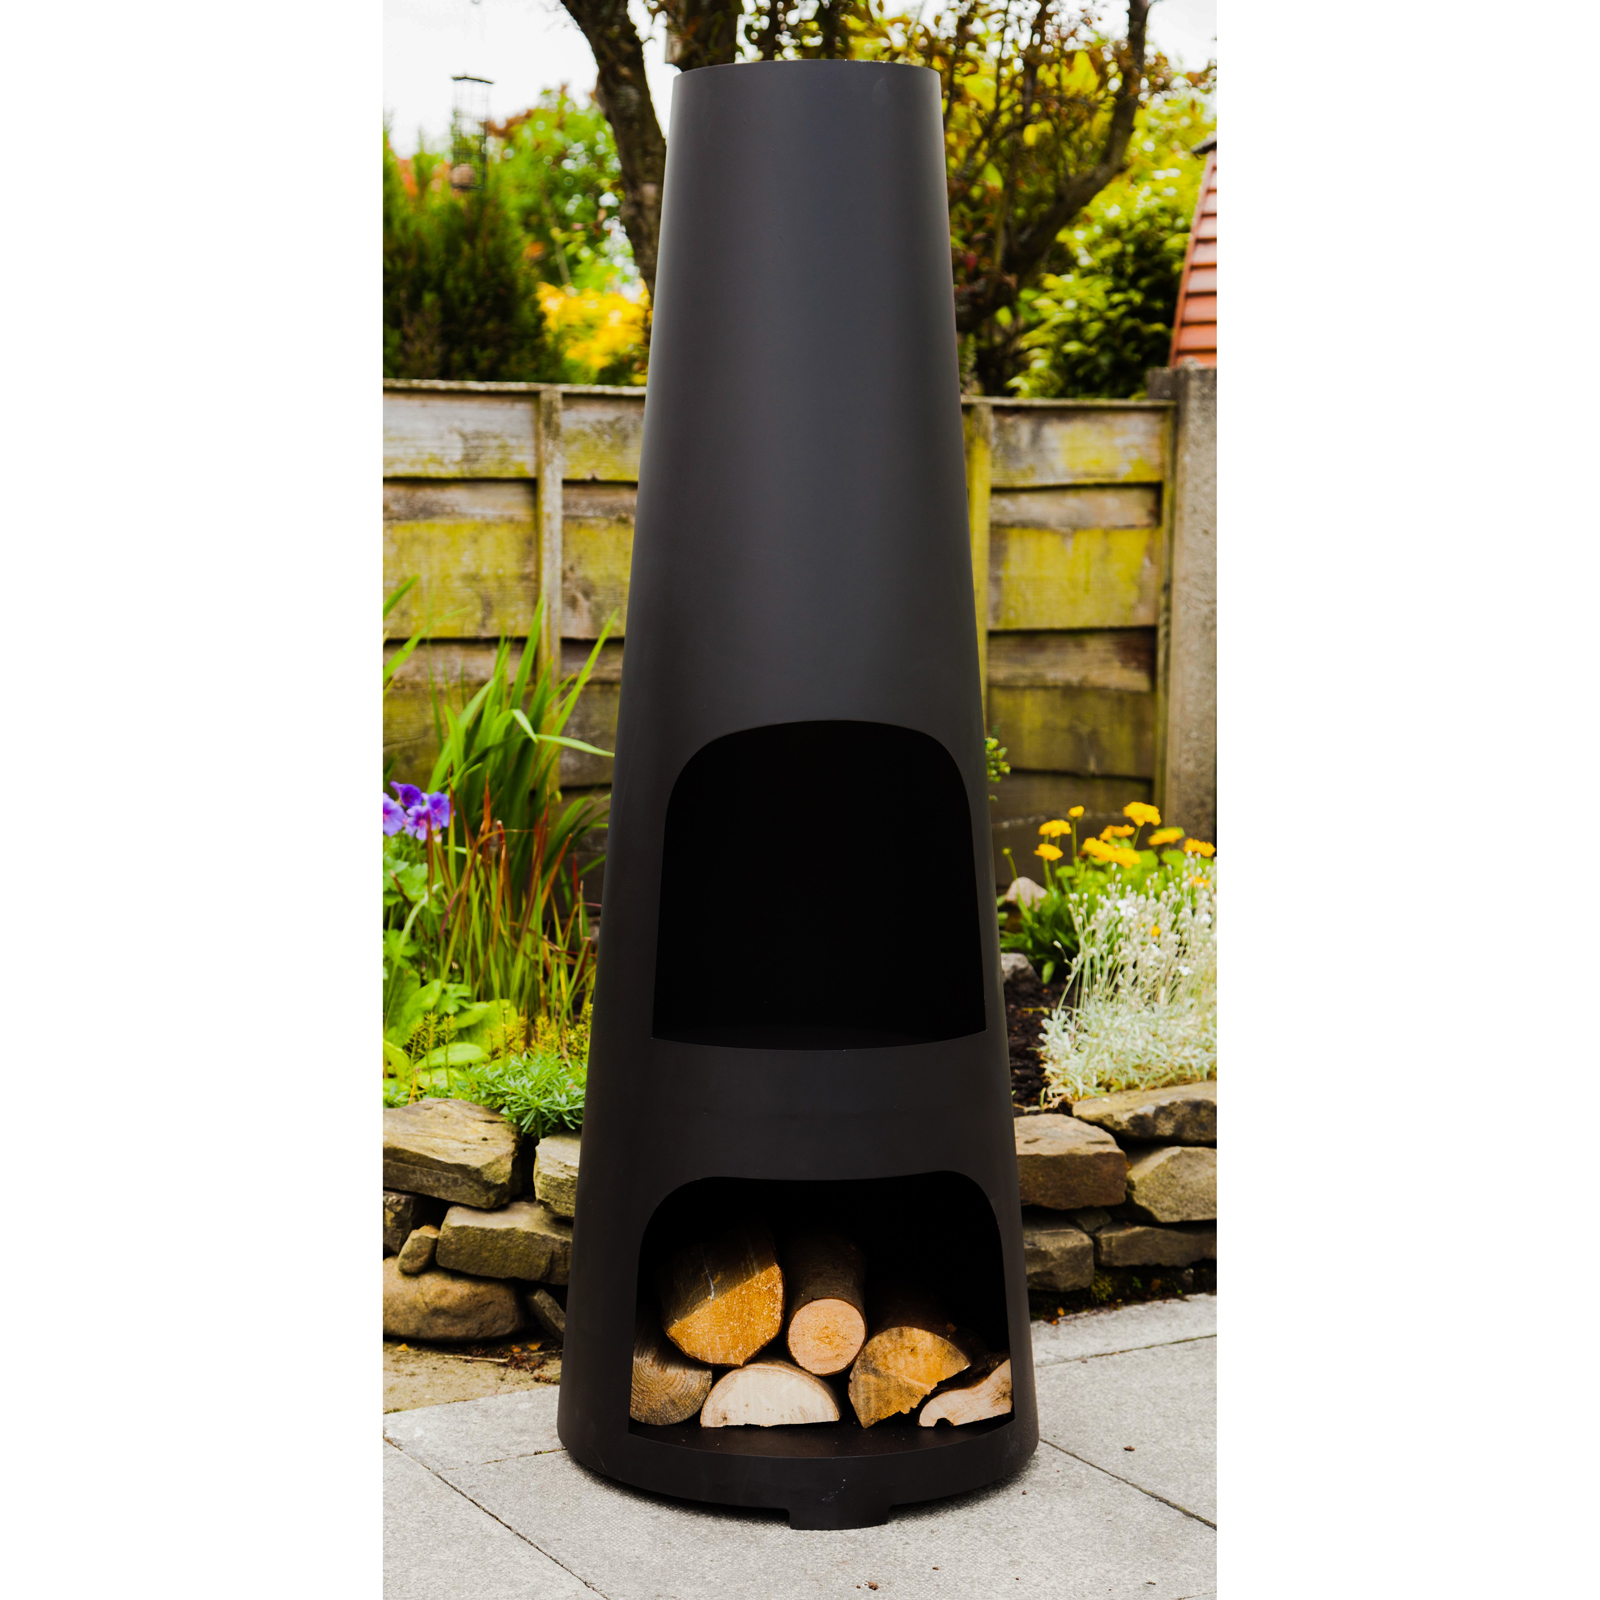 made o 39 metal garden patio fire chimney heater large steel wood burner chimenea ebay. Black Bedroom Furniture Sets. Home Design Ideas